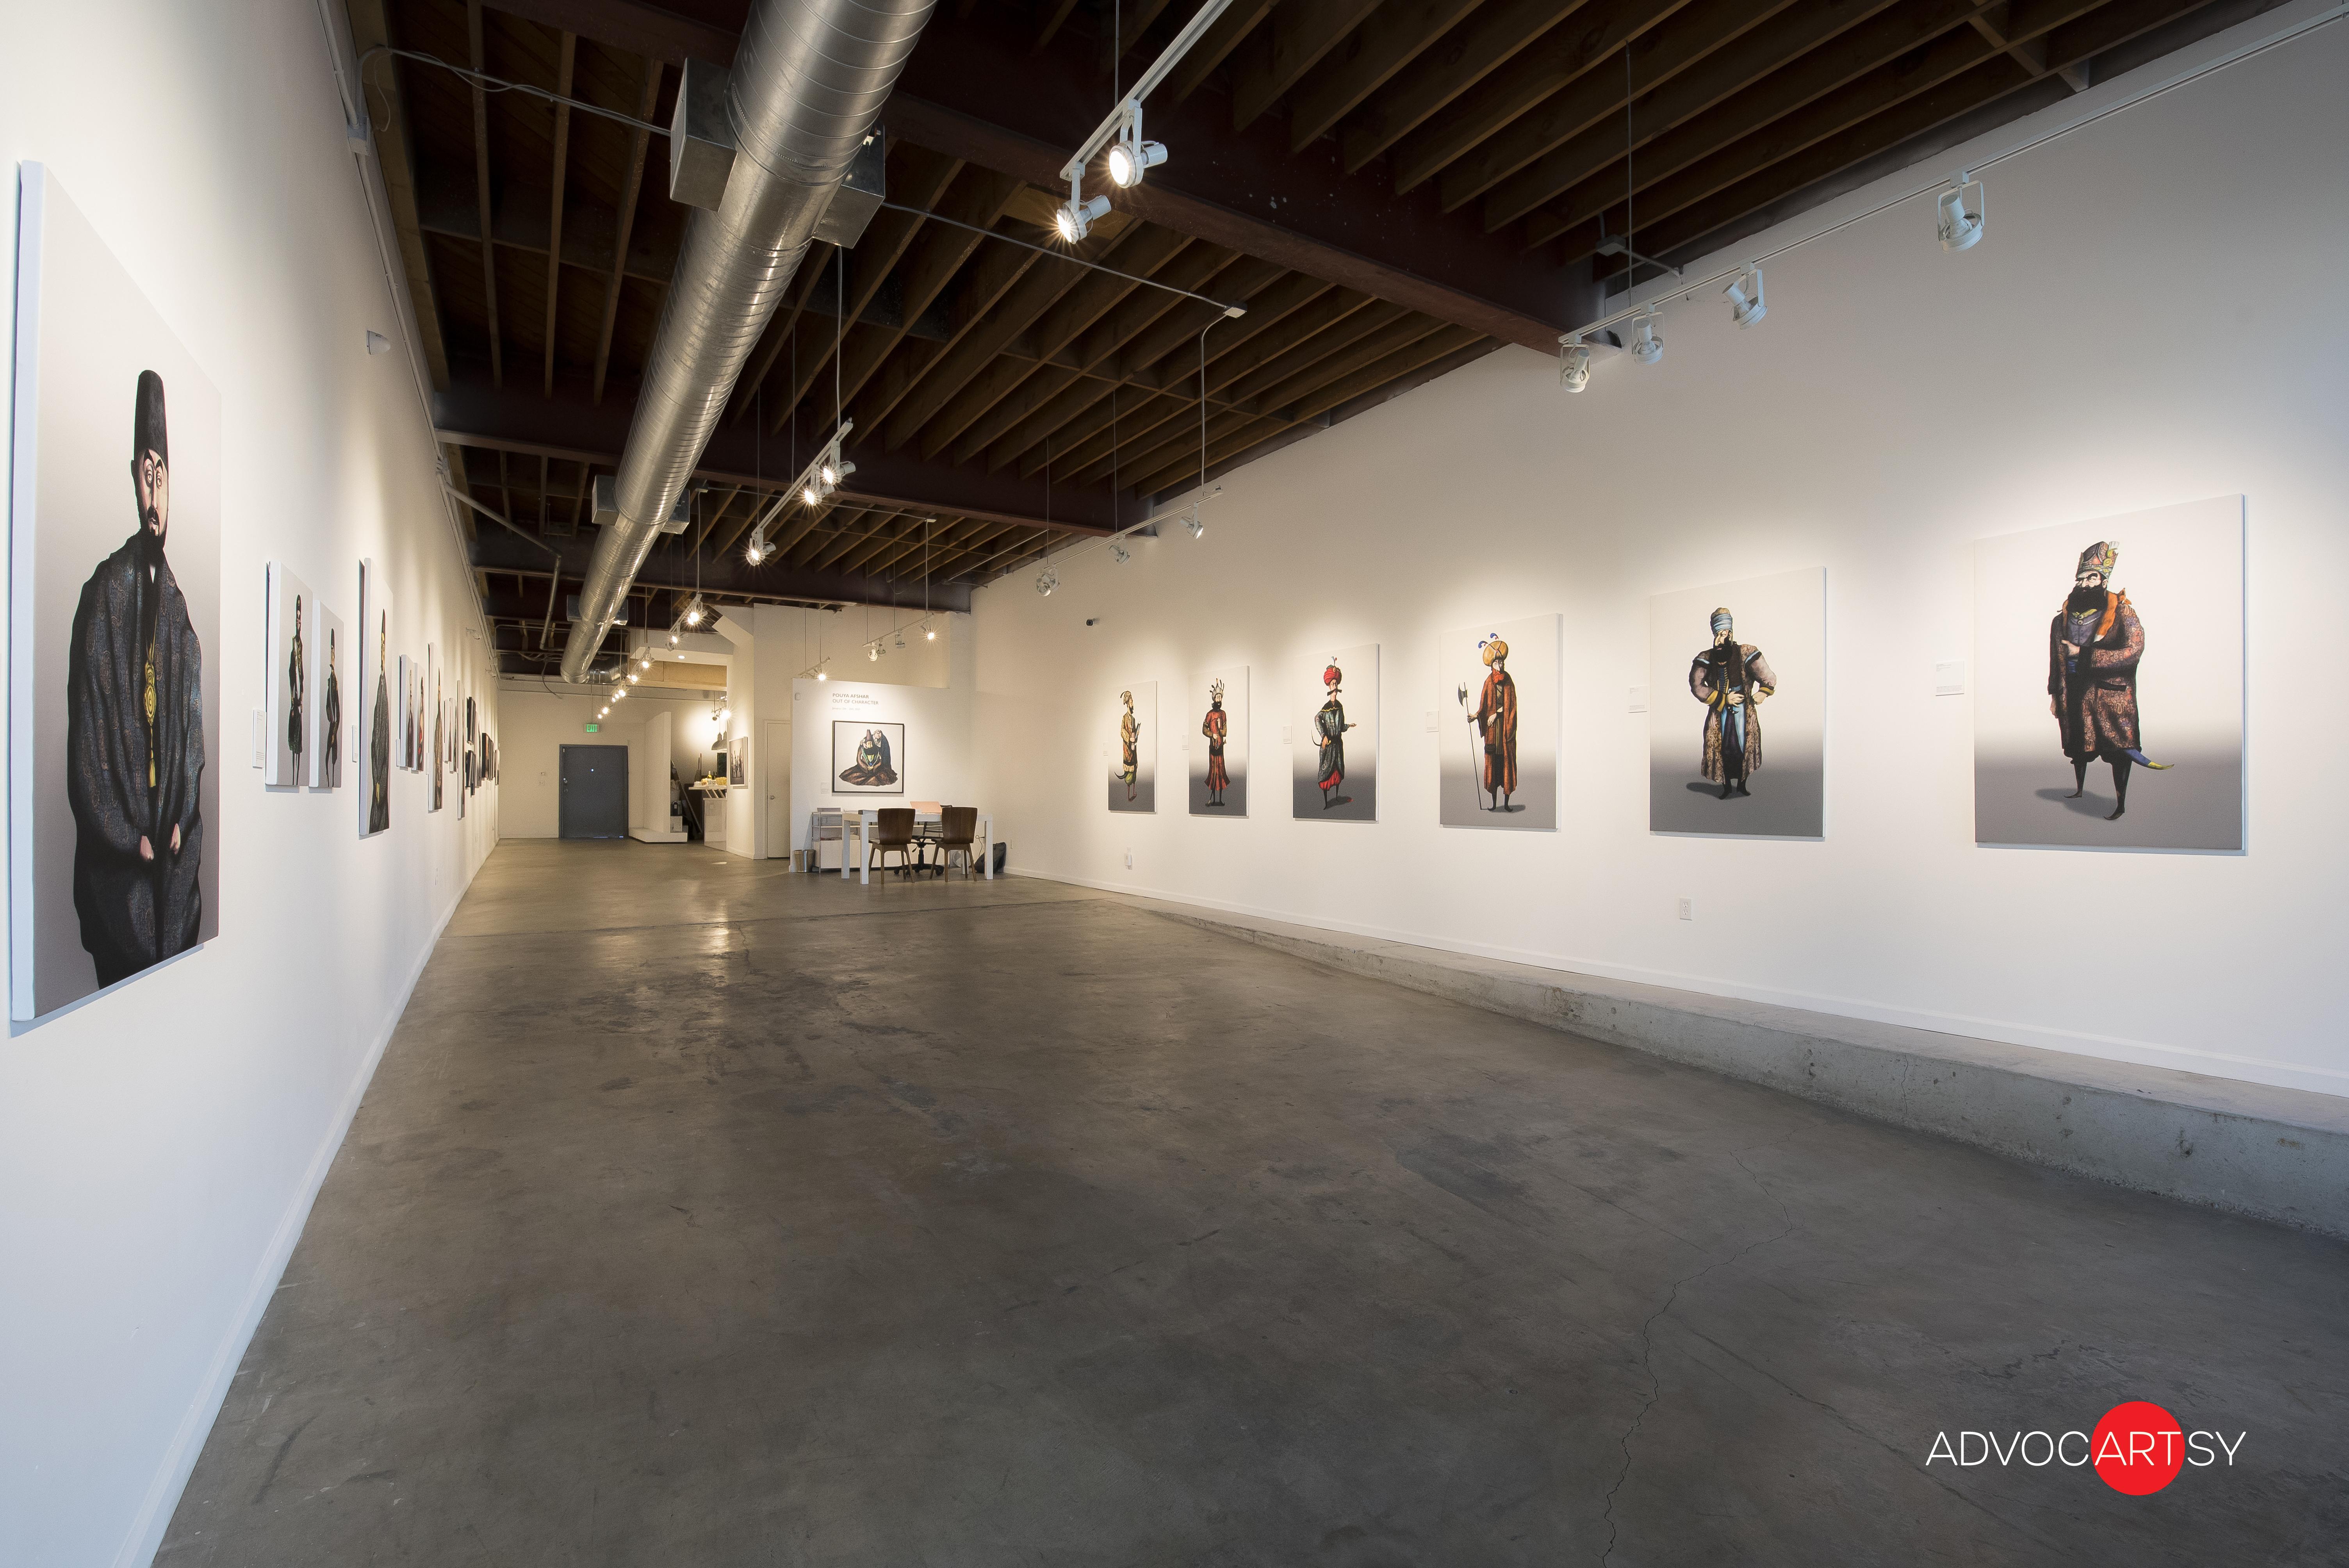 iranian-contemporary-artist-pouya-afshar